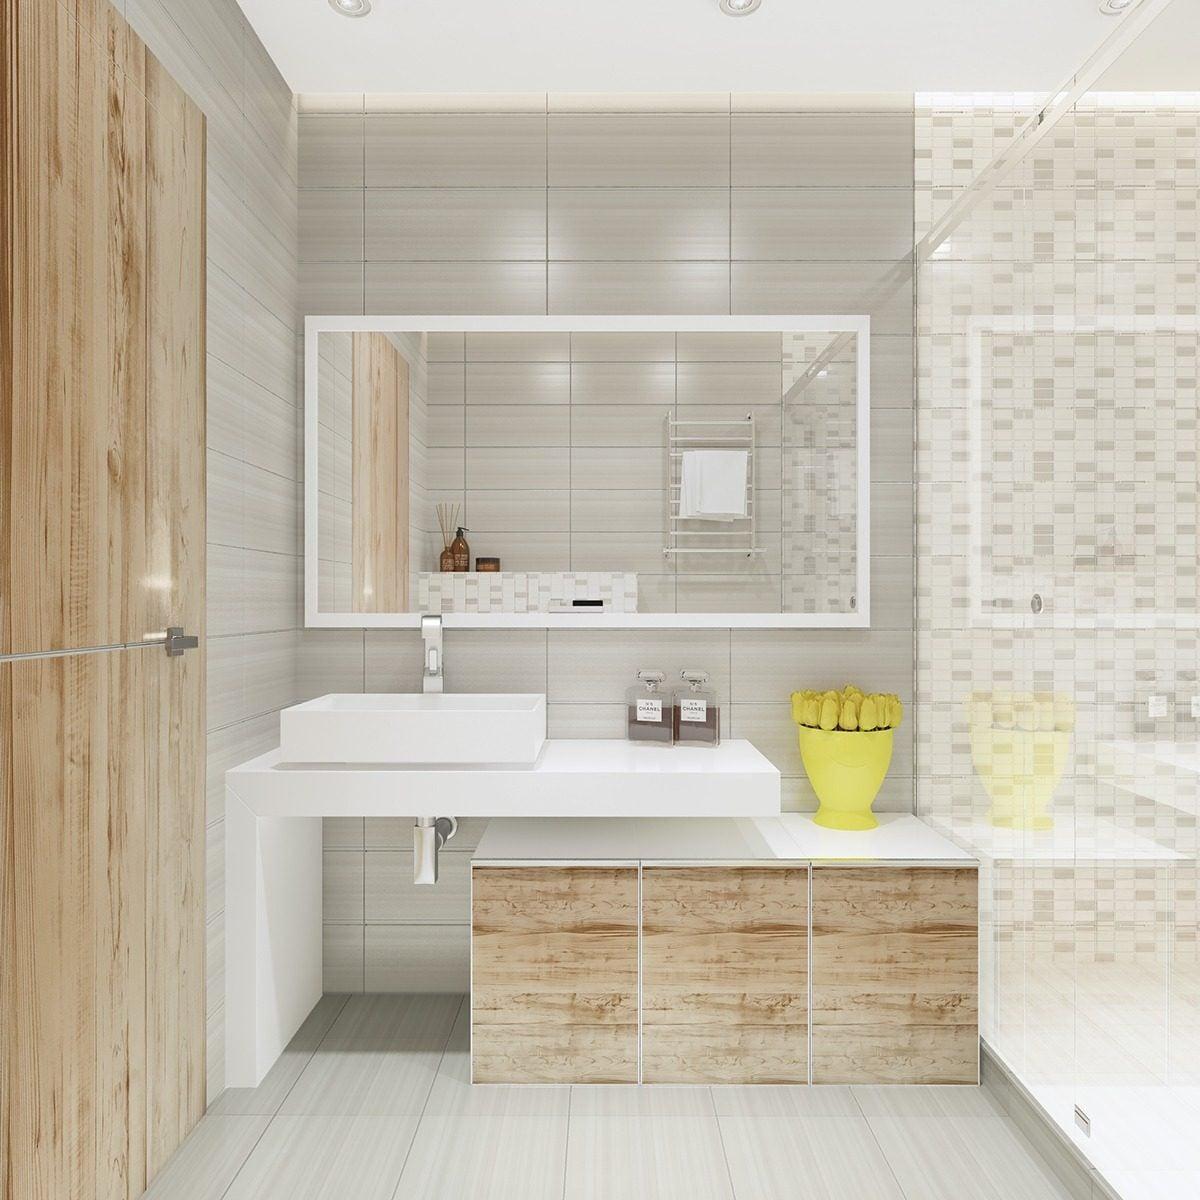 27wood-bathroom-design